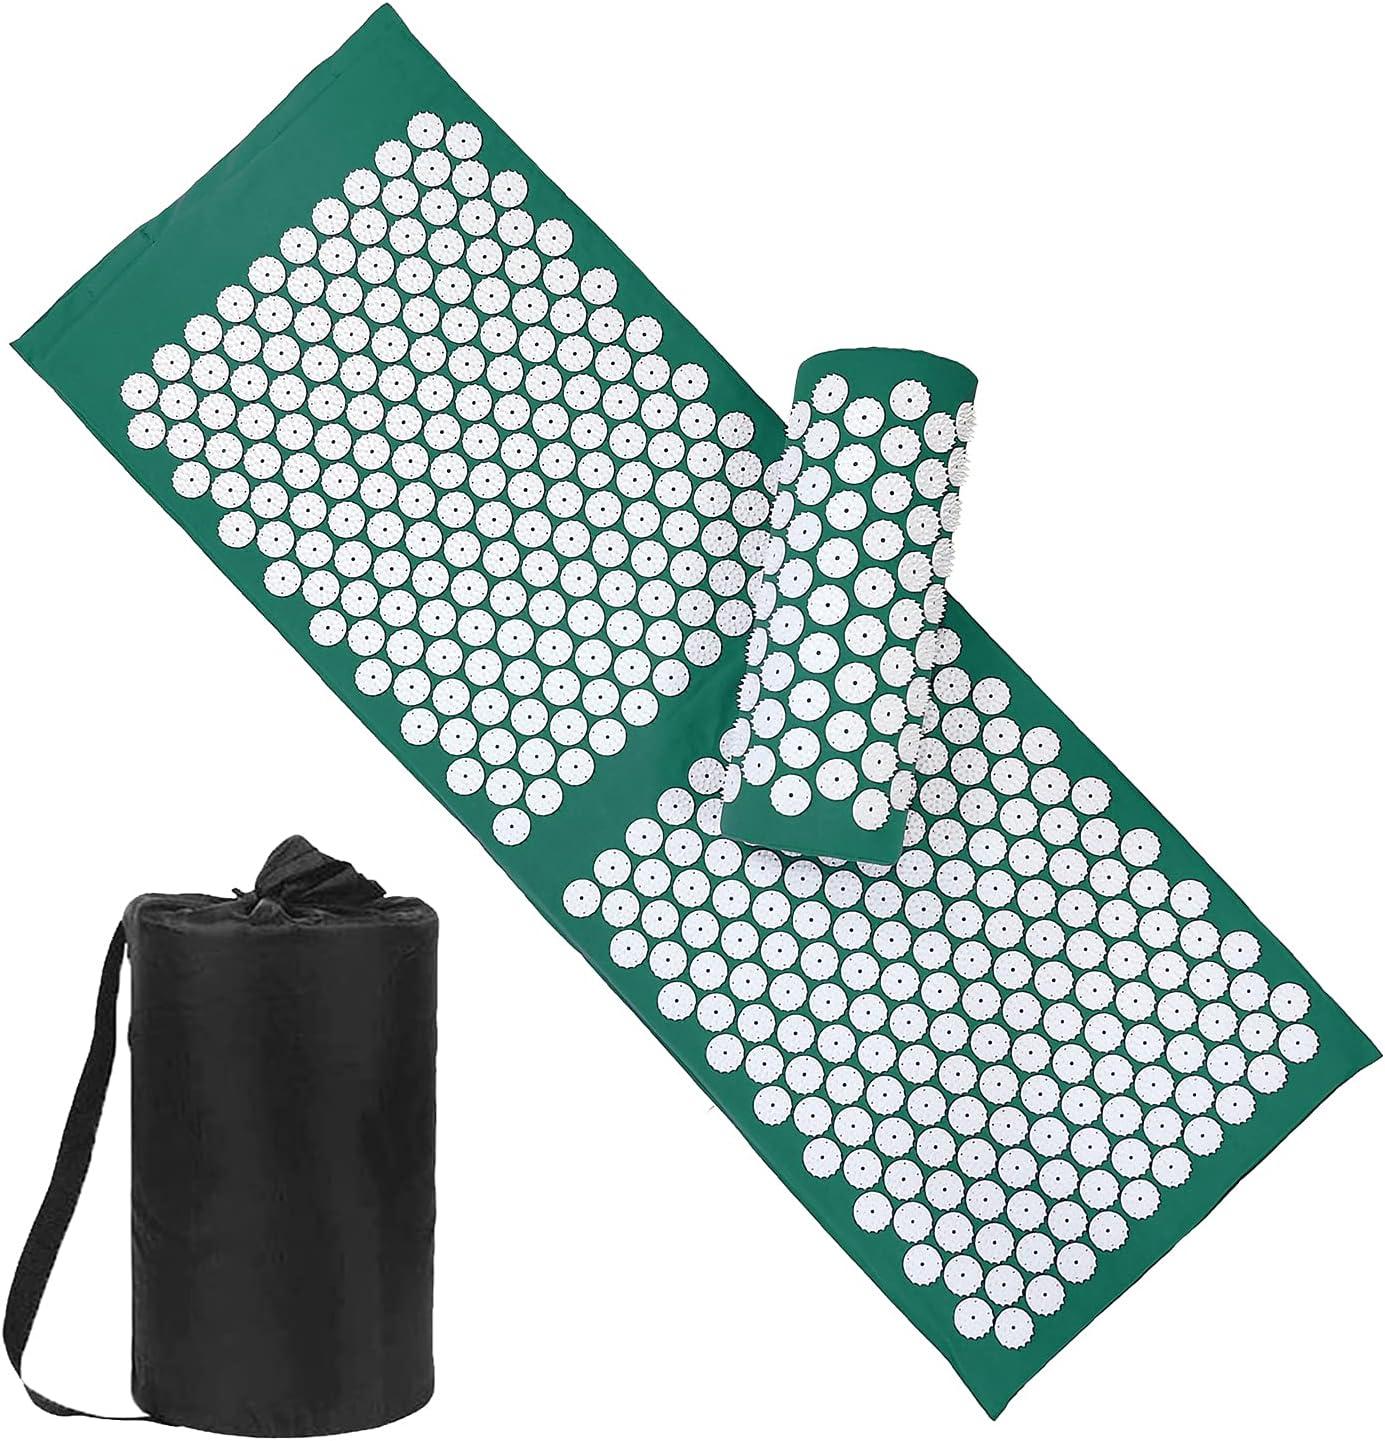 Acupressure Mat and Pillow Set 新作からSALEアイテム等お得な商品 満載 with Bag X 16.9 49.2 開店記念セール Large Size -